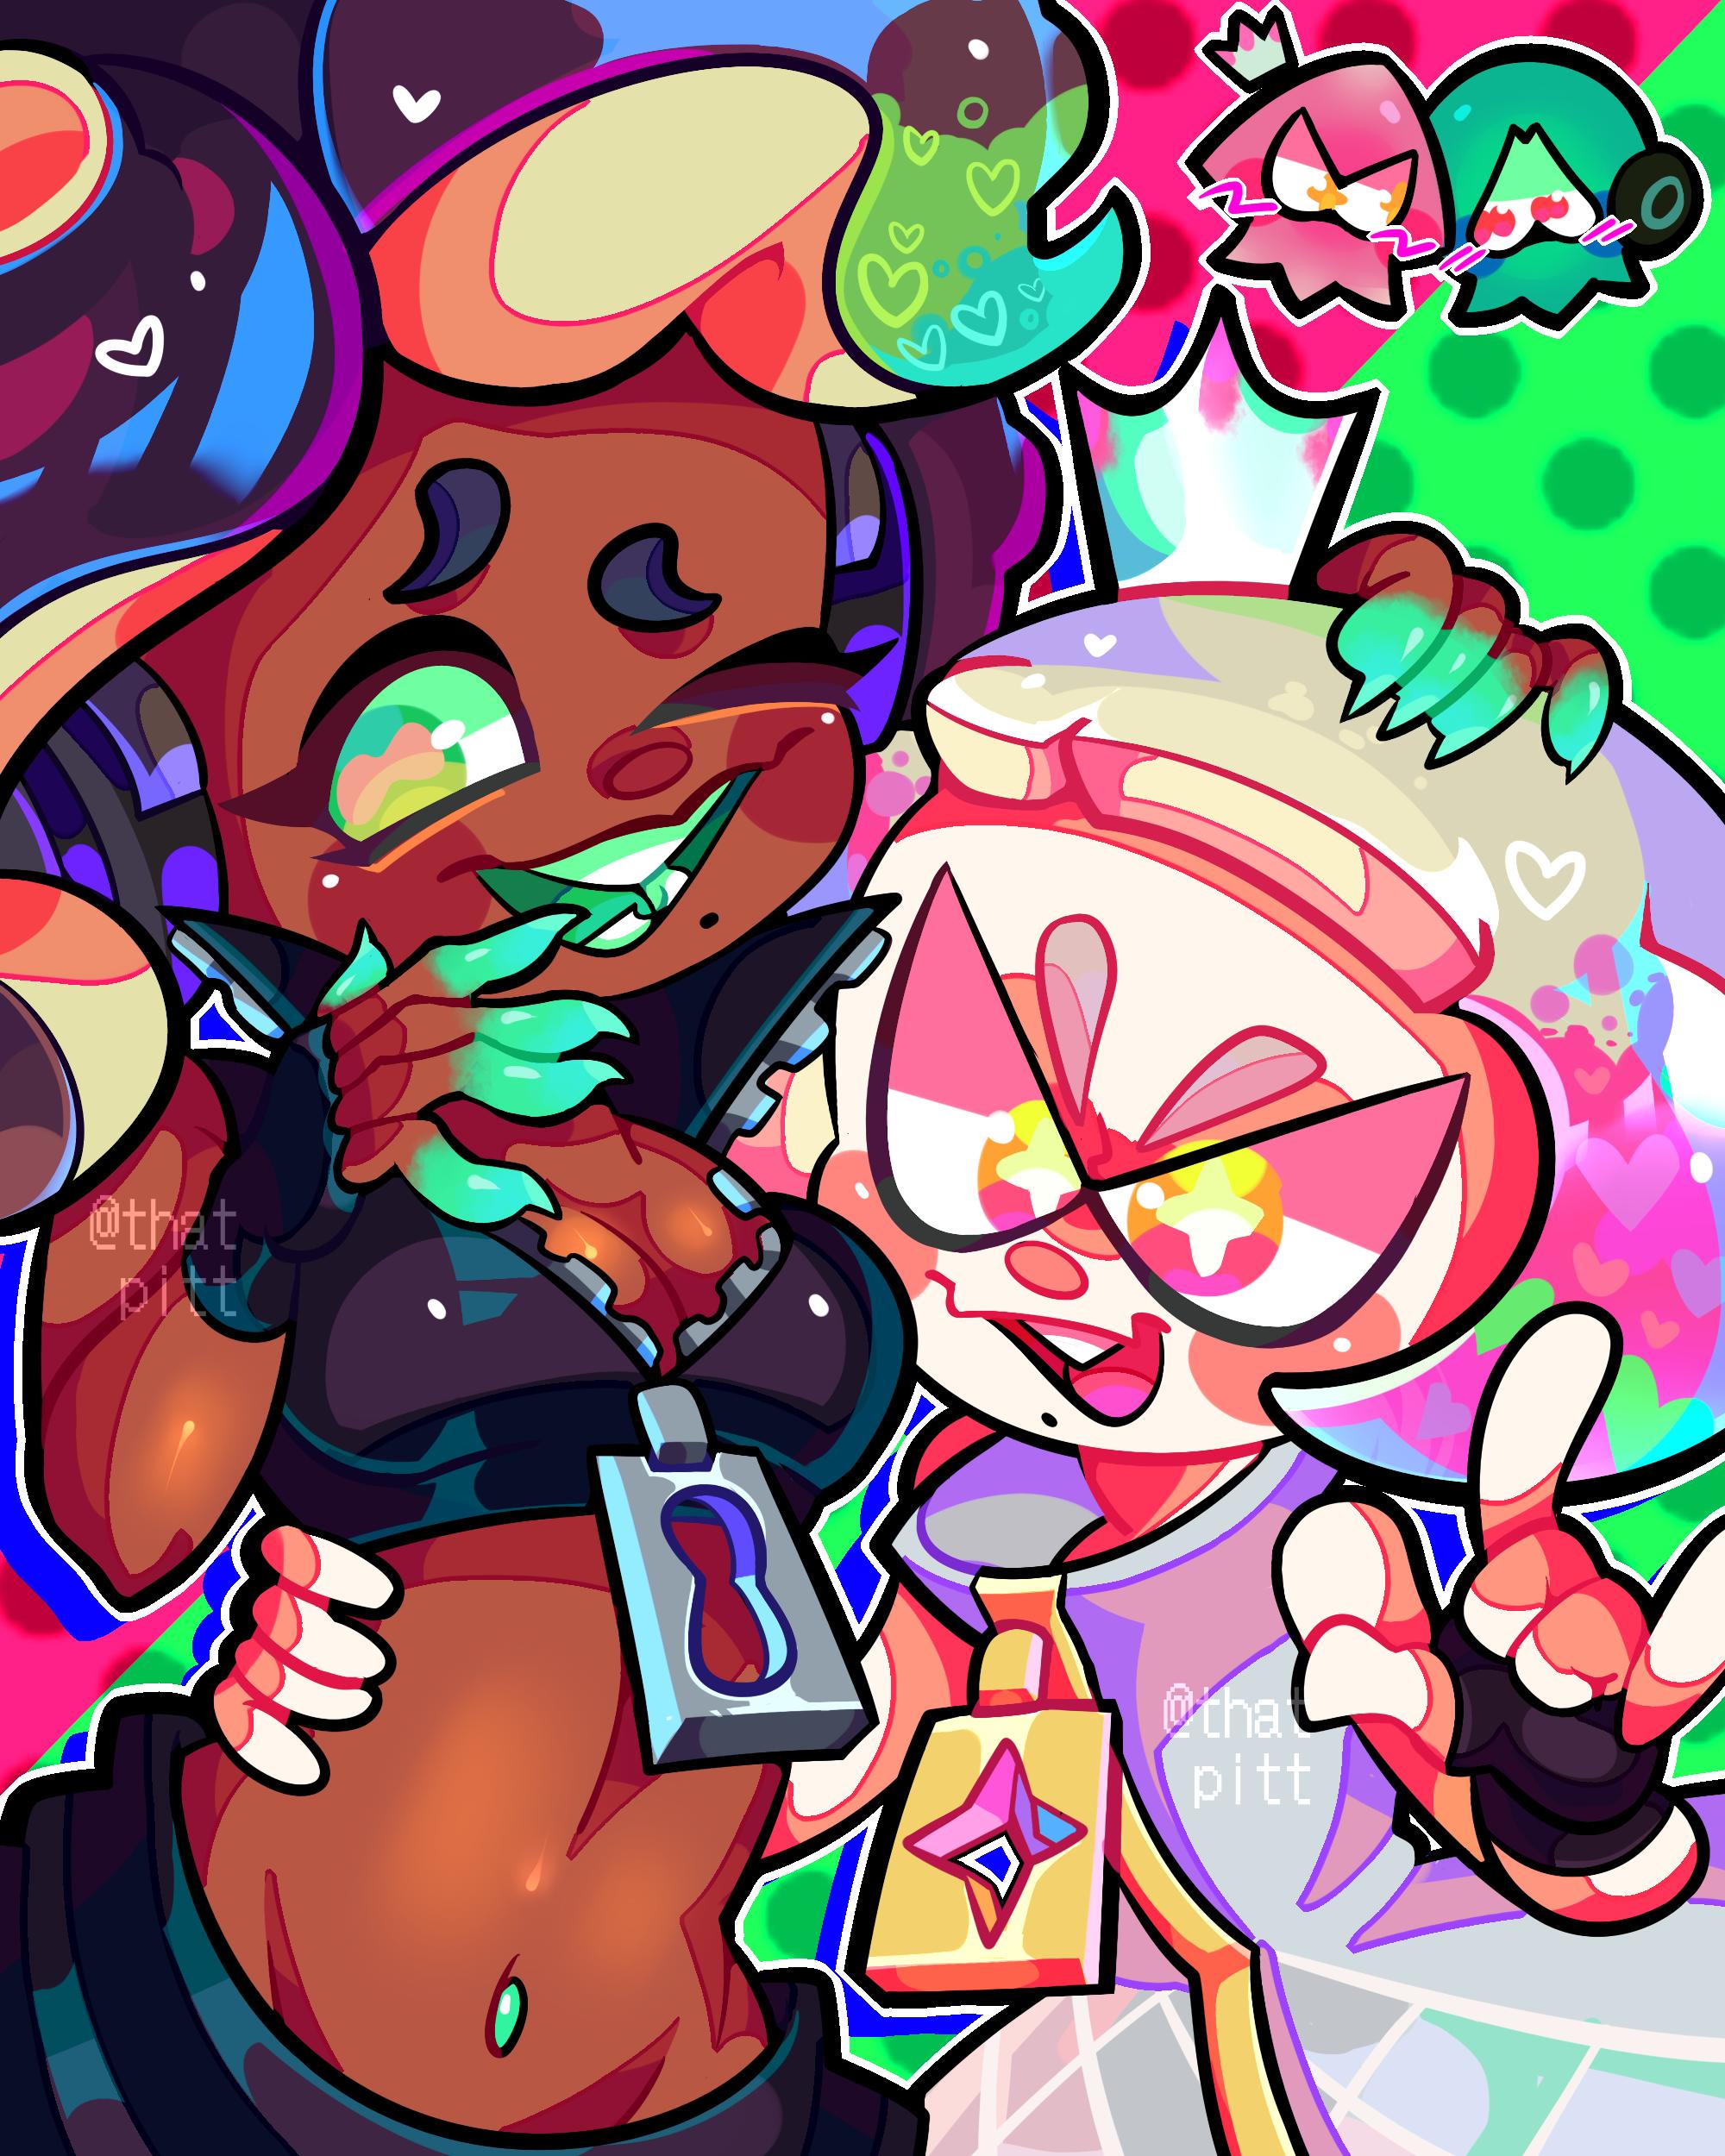 gay squids